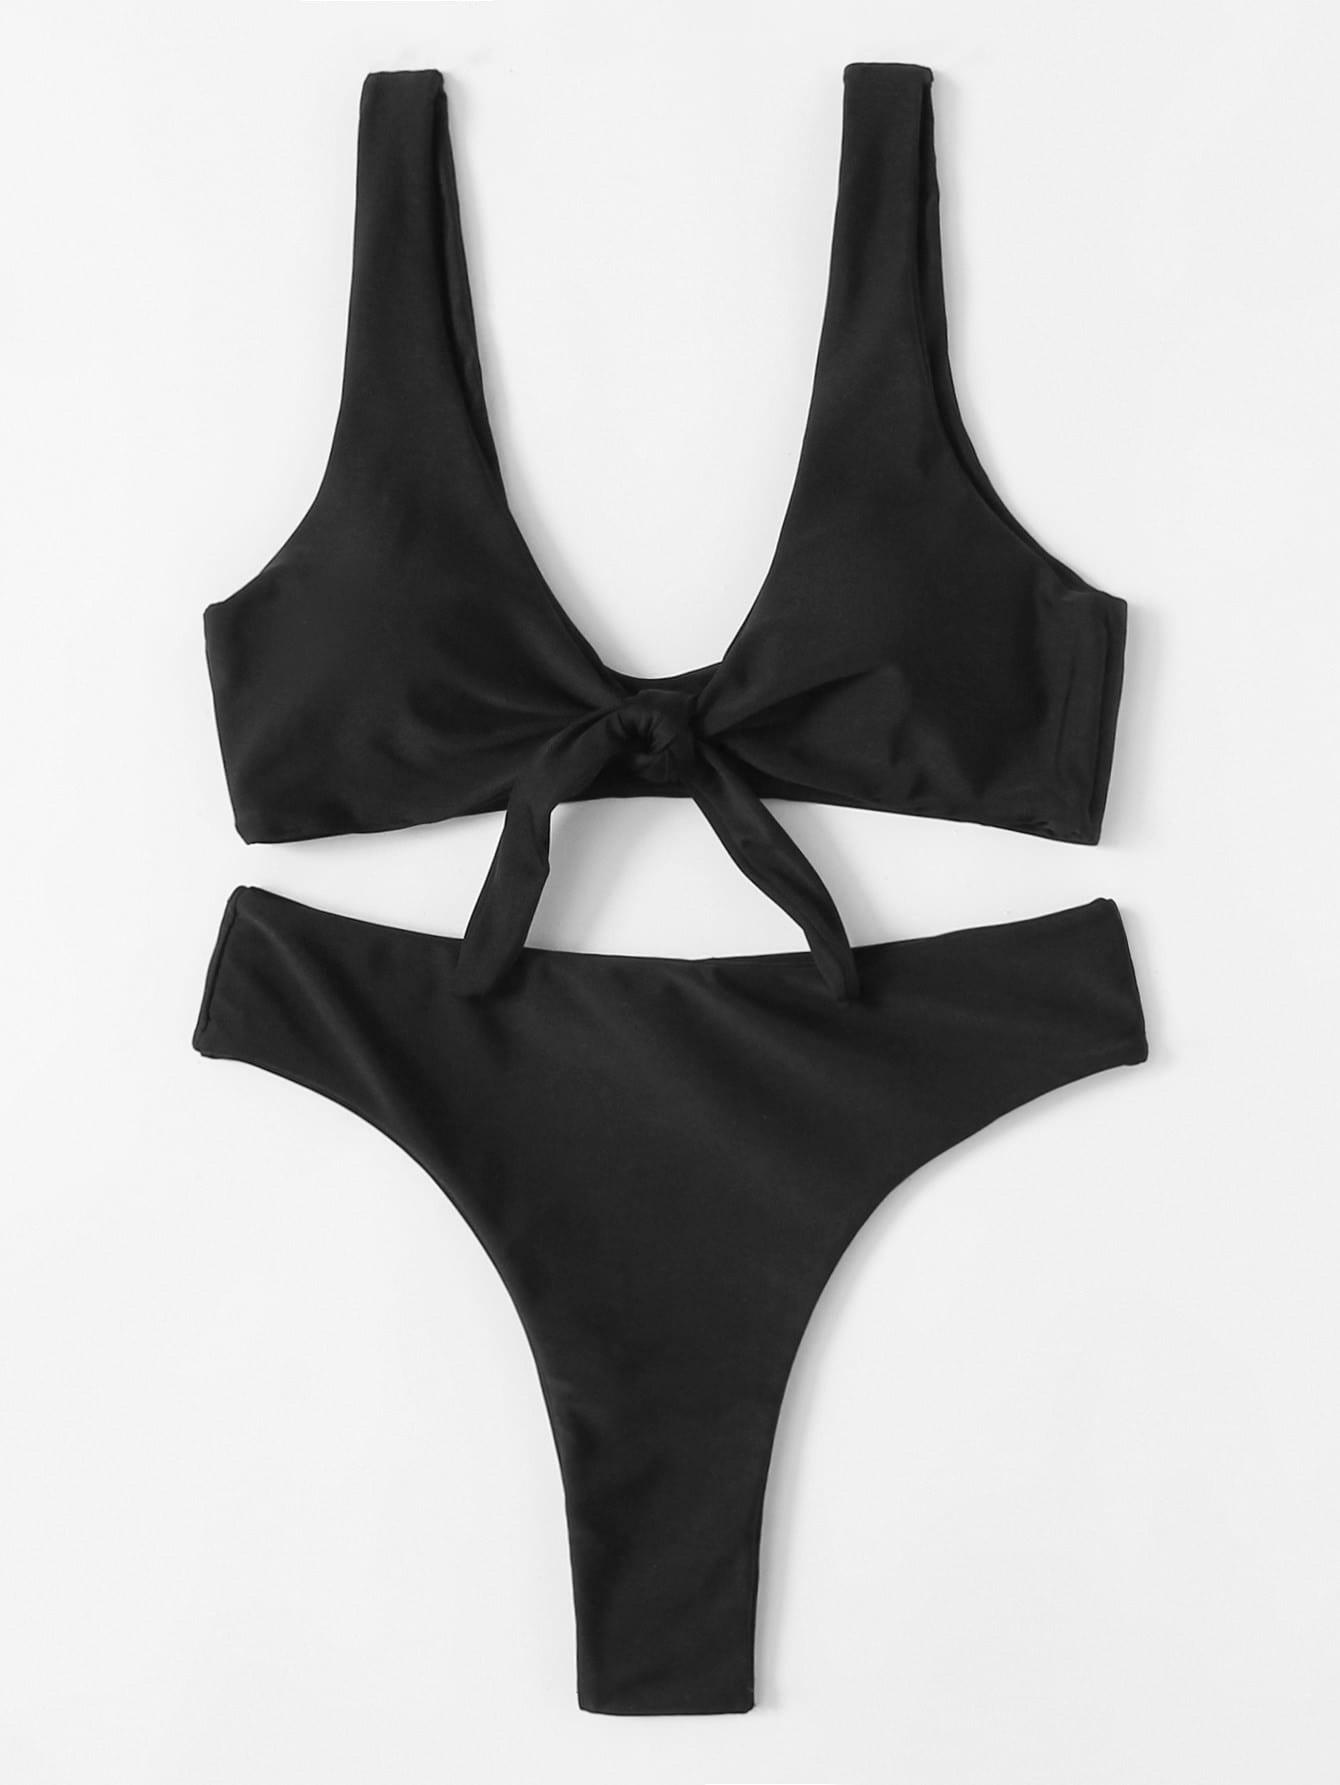 Knot Front Plunge Neckline Bikini Set plunge neckline open back bikini set